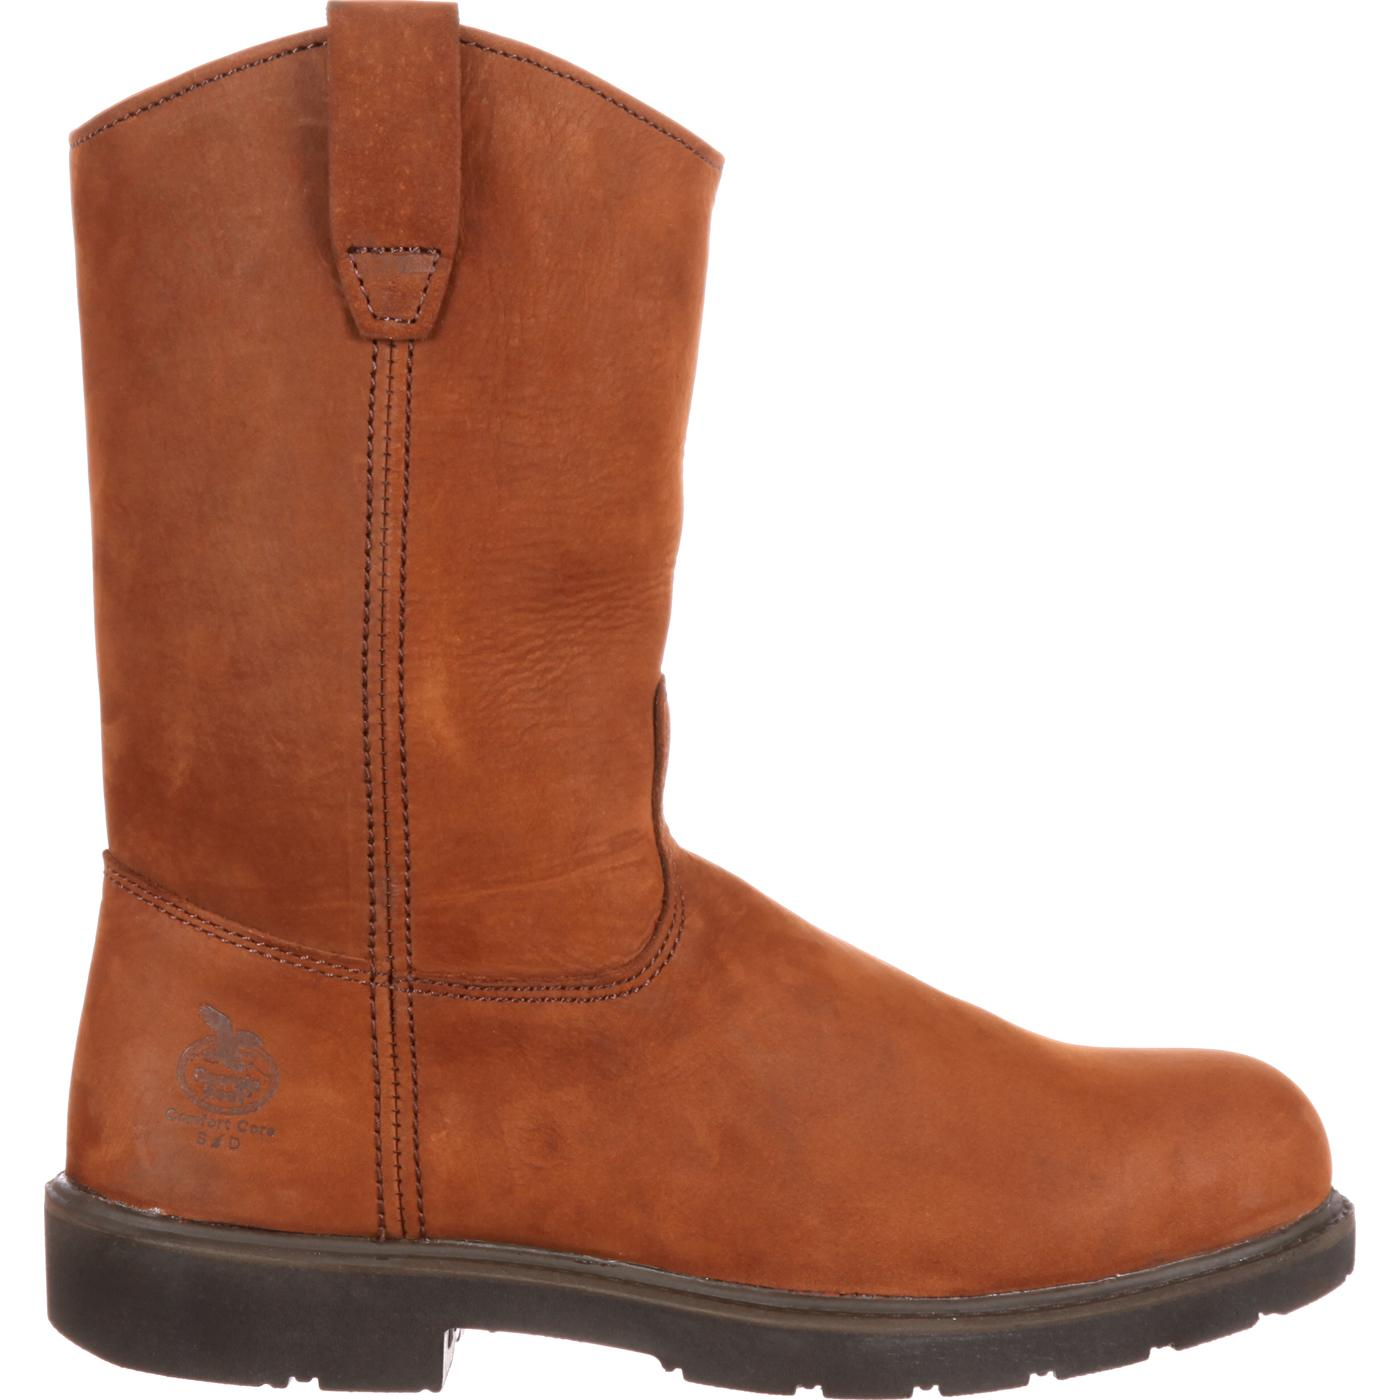 ad1eab01dd9d80 Georgia Boot  Men s Pull-On Steel Toe Work Boots